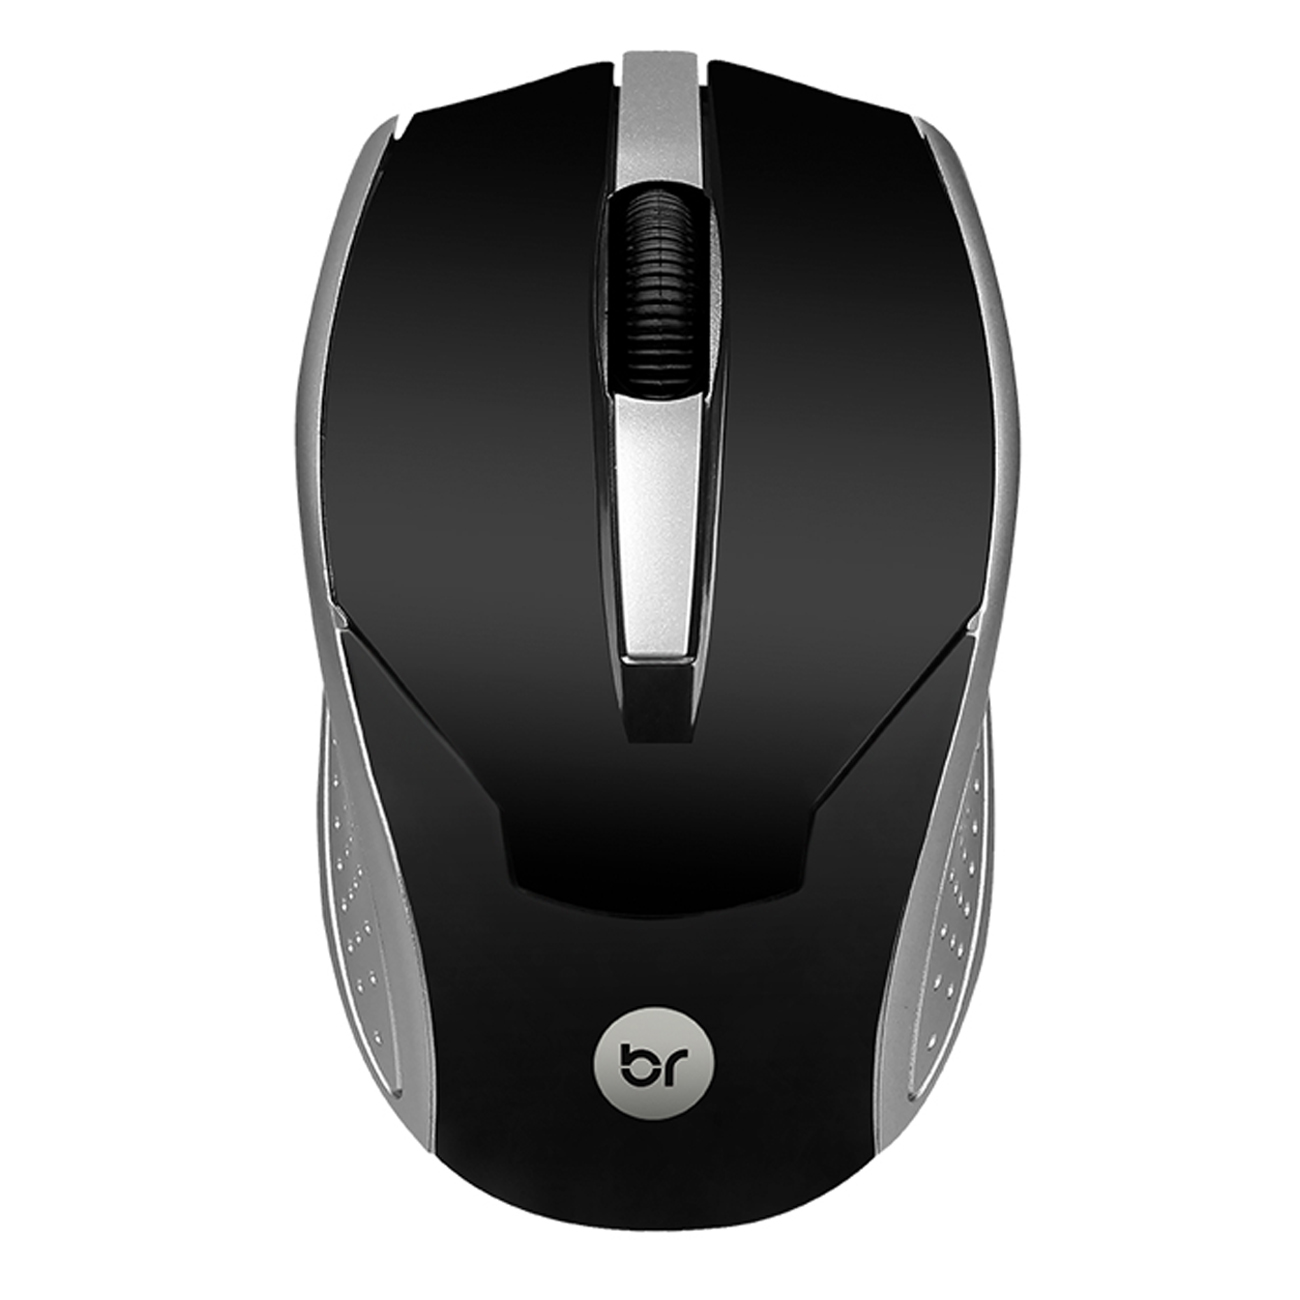 Kit 5 Mouses Usb Preto e Prata 800Dpi Bright 28